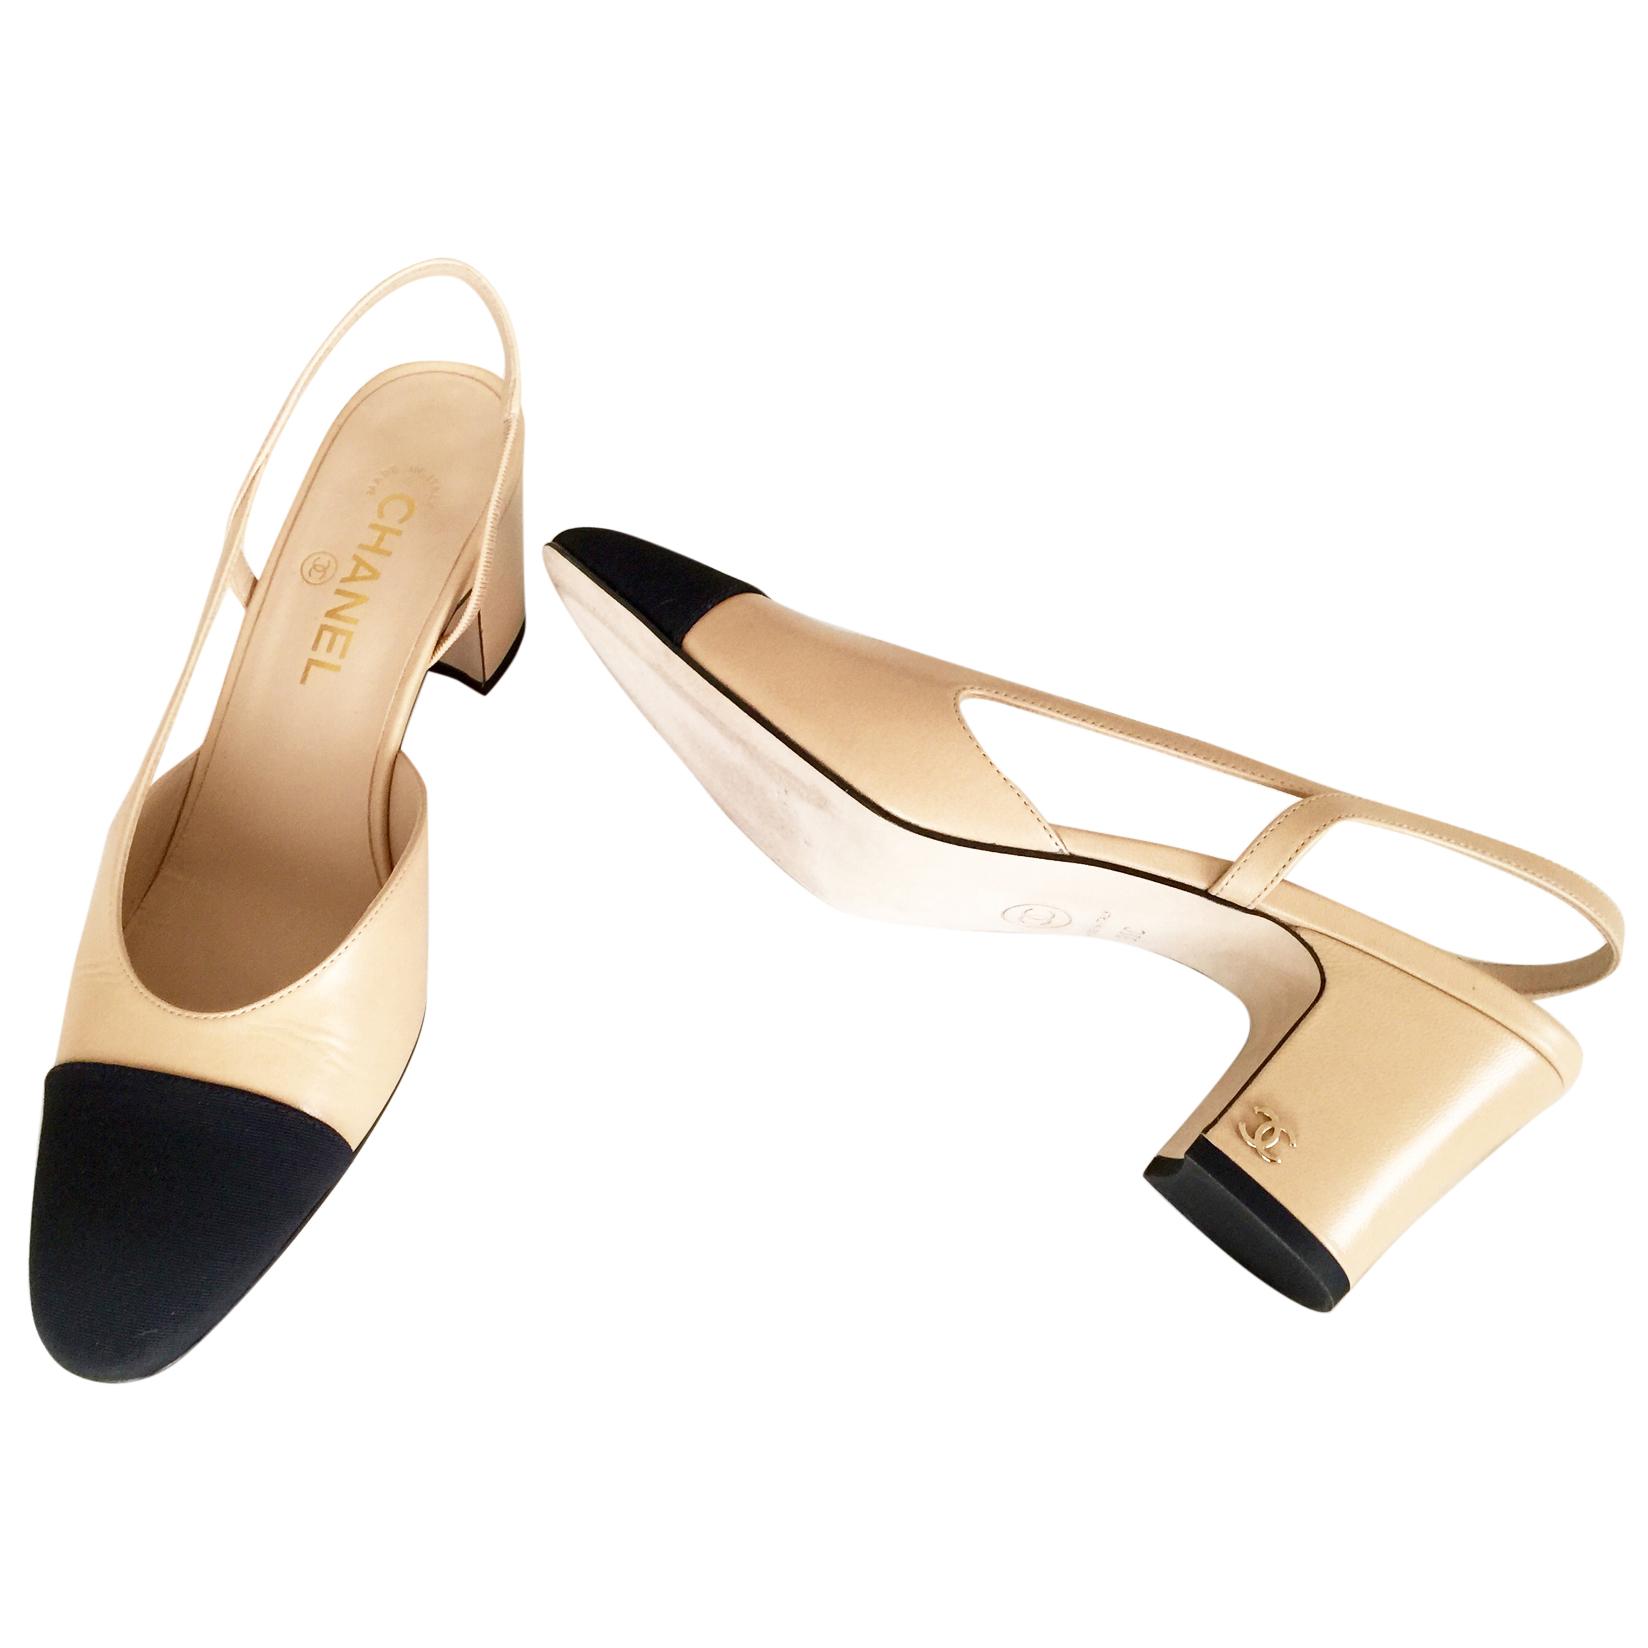 2b96ae79f5 Chanel Slingback Shoes Beige And Black   HEWI London